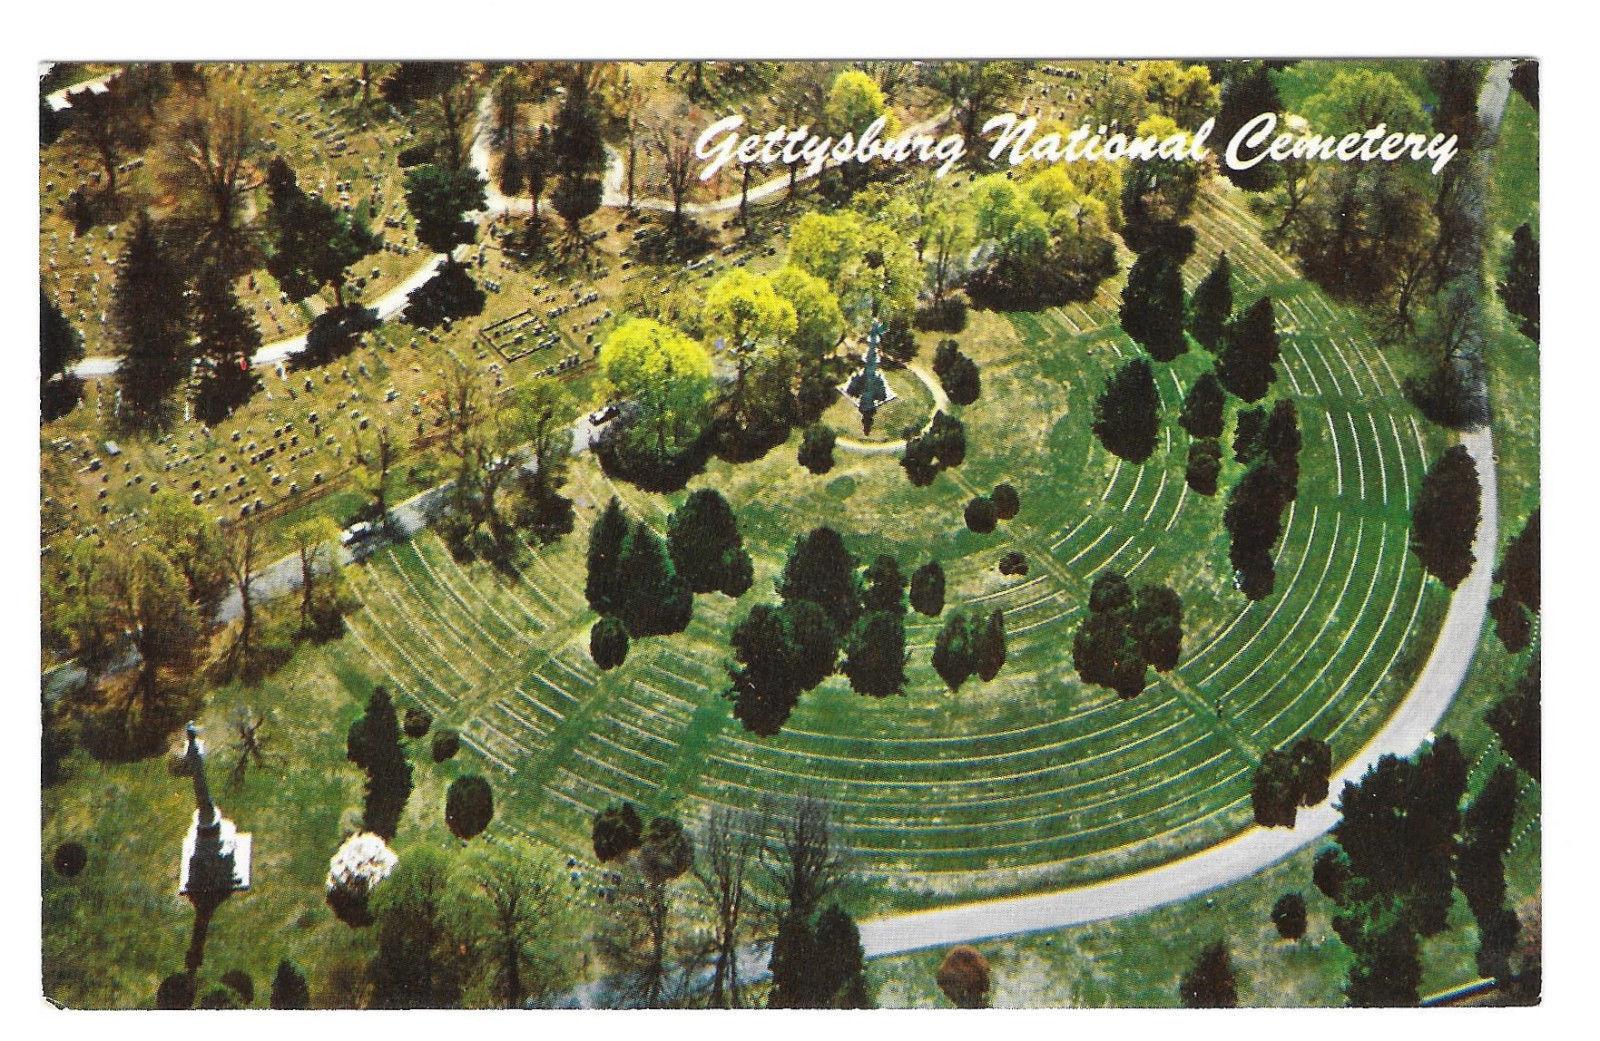 Gettysburg Civil War National Cemetery Aerial View Vtg L.E. Smith Postcard PA